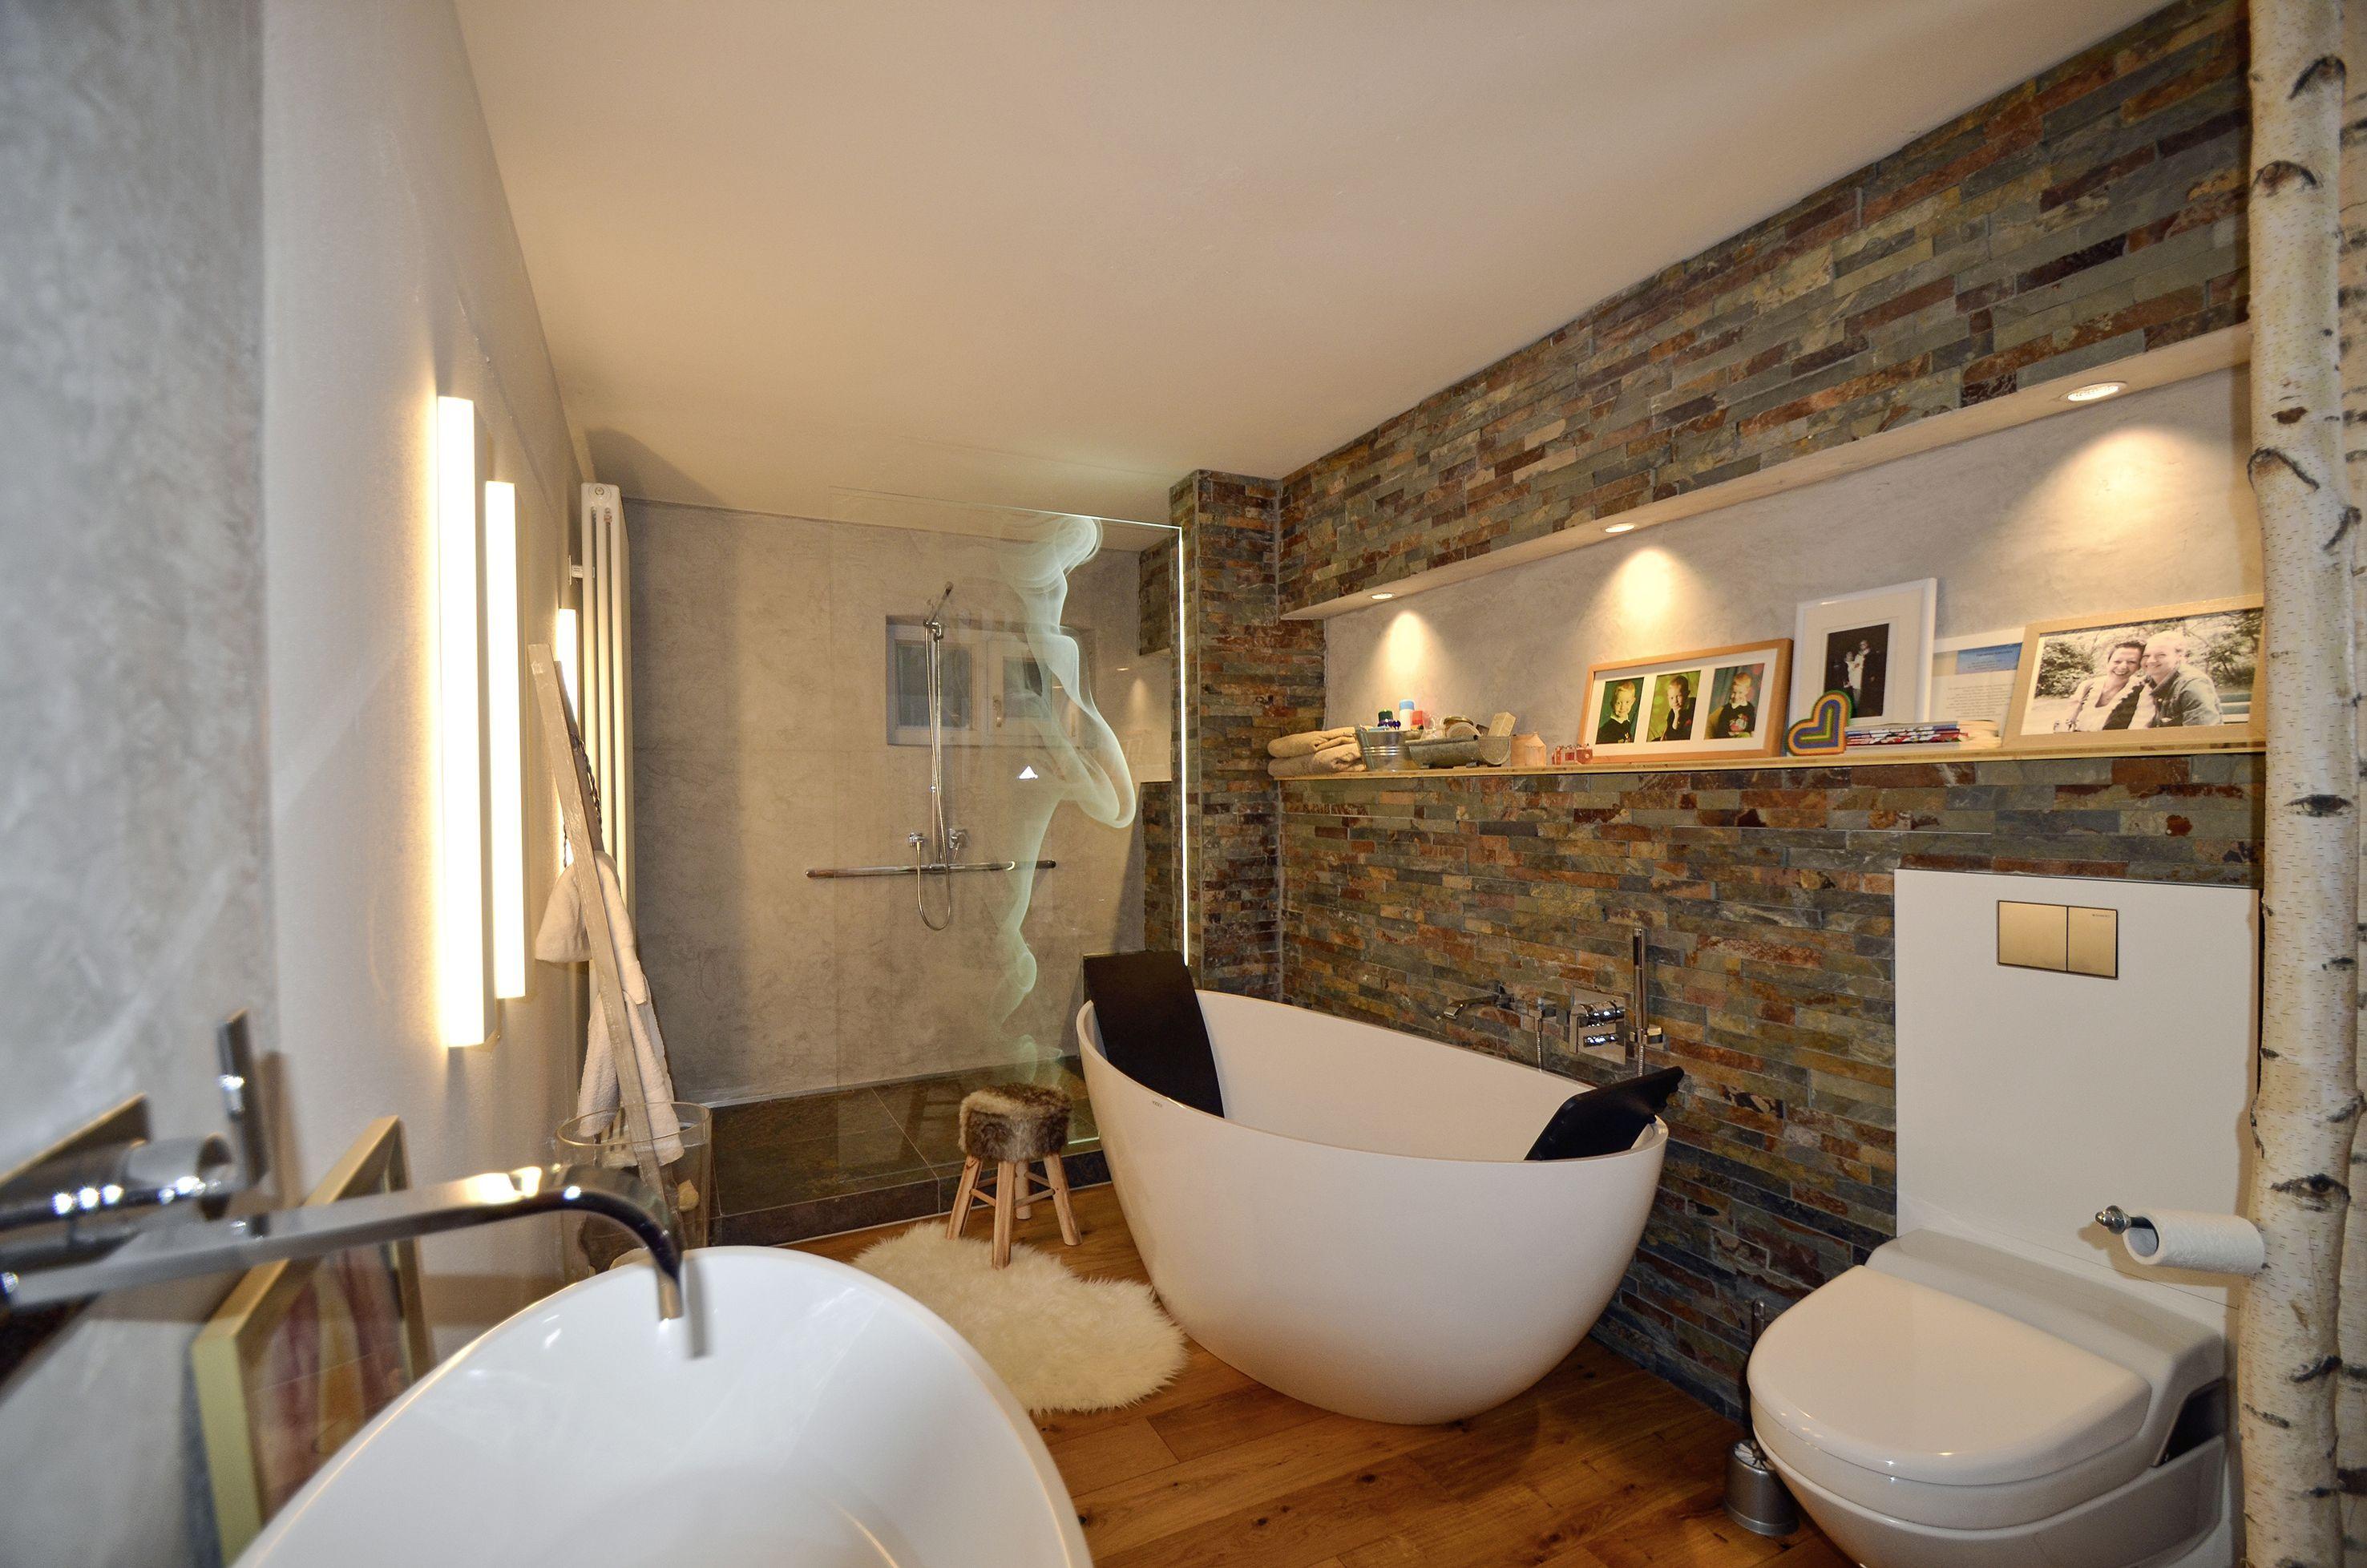 5 Beispiele Fur Die Planung Freistehender Badewannen Badewanne Freistehende Badewanne Und Bad Design